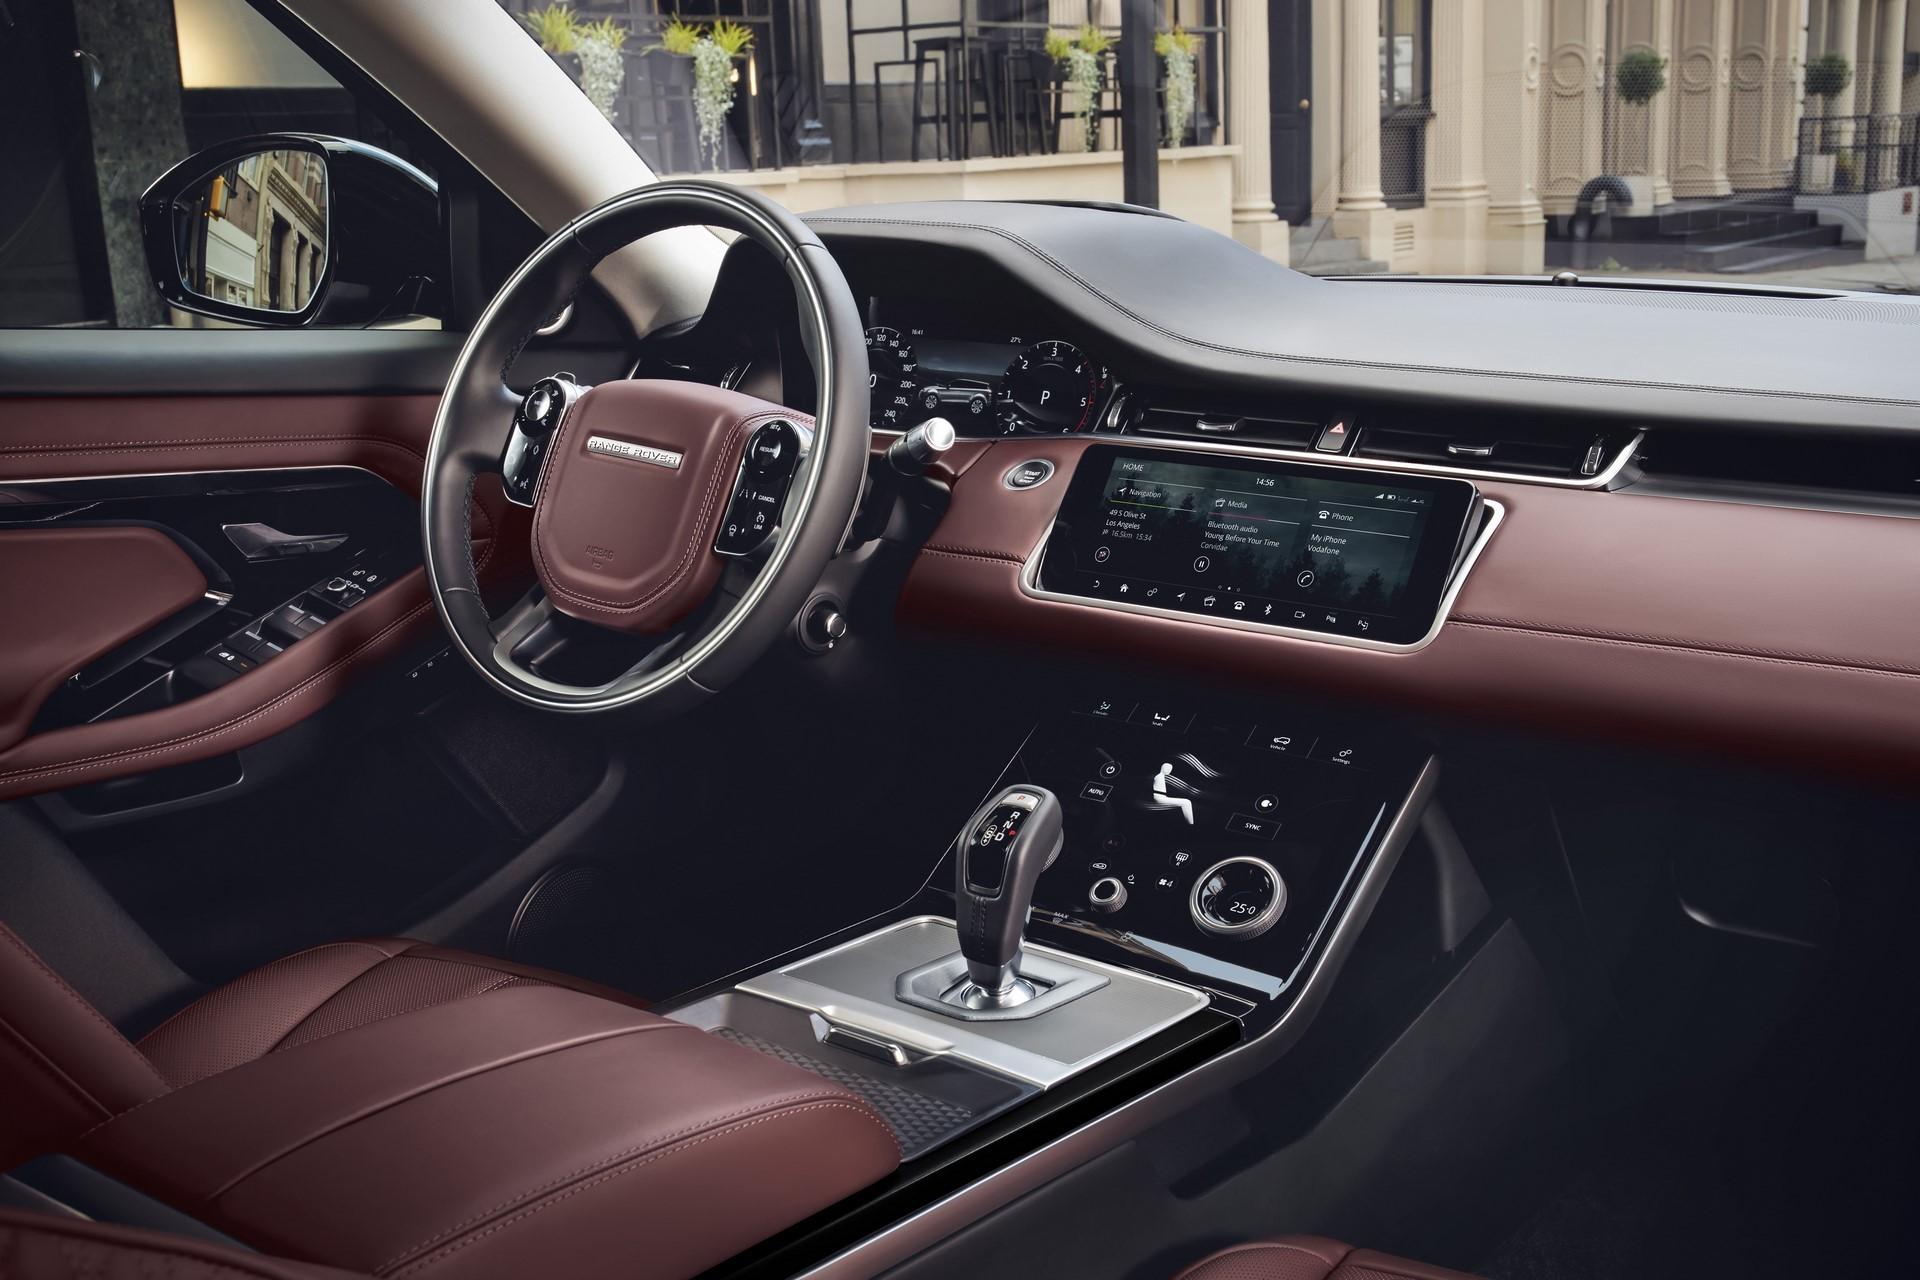 Range Rover Evoque 2019 (60)